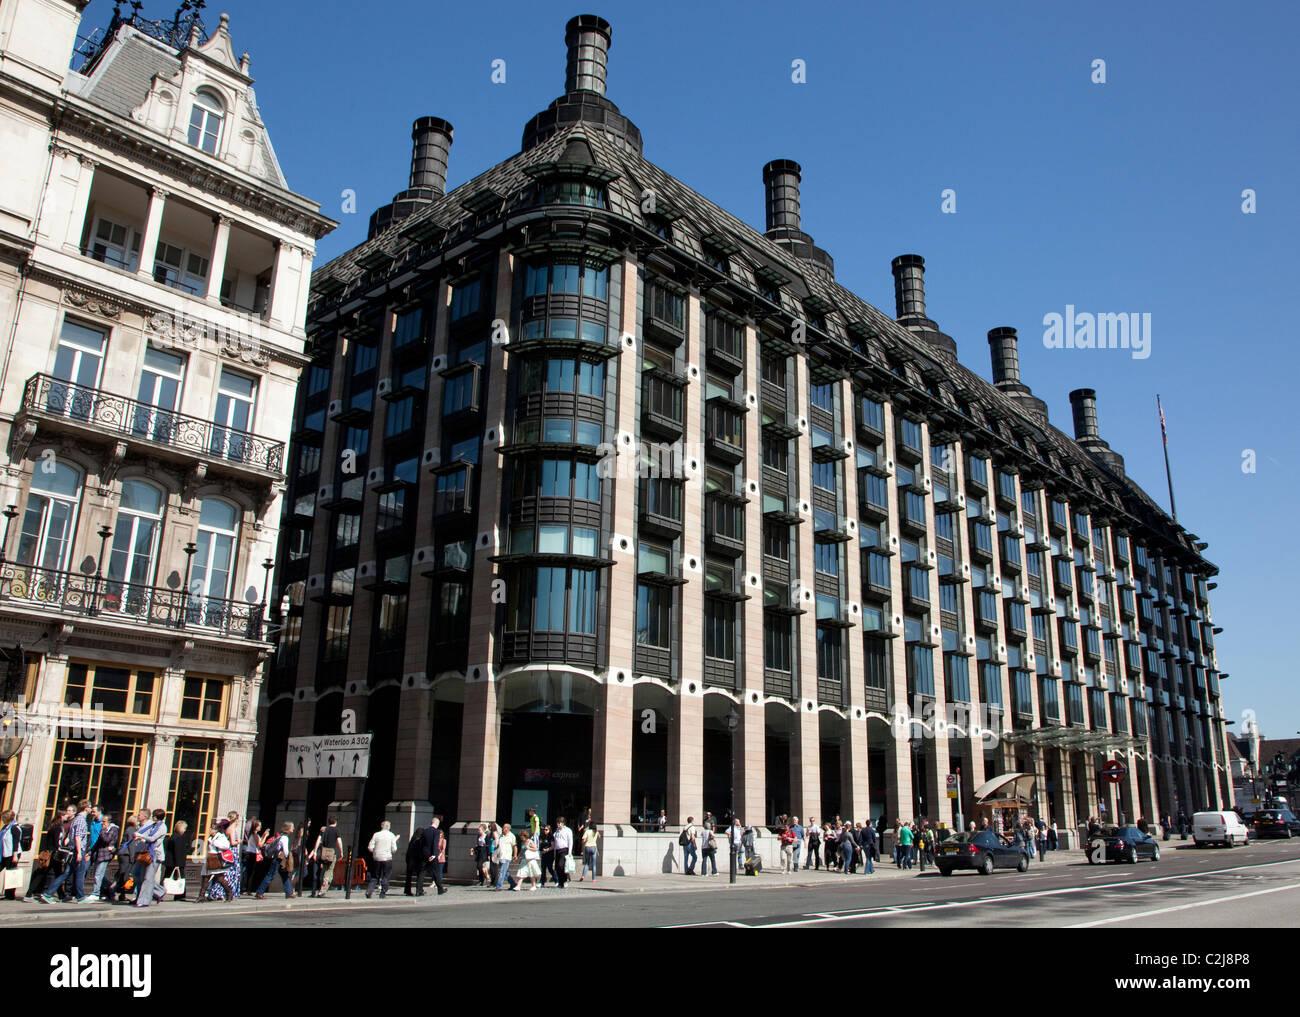 Portcullis House, Westminster, London - Stock Image